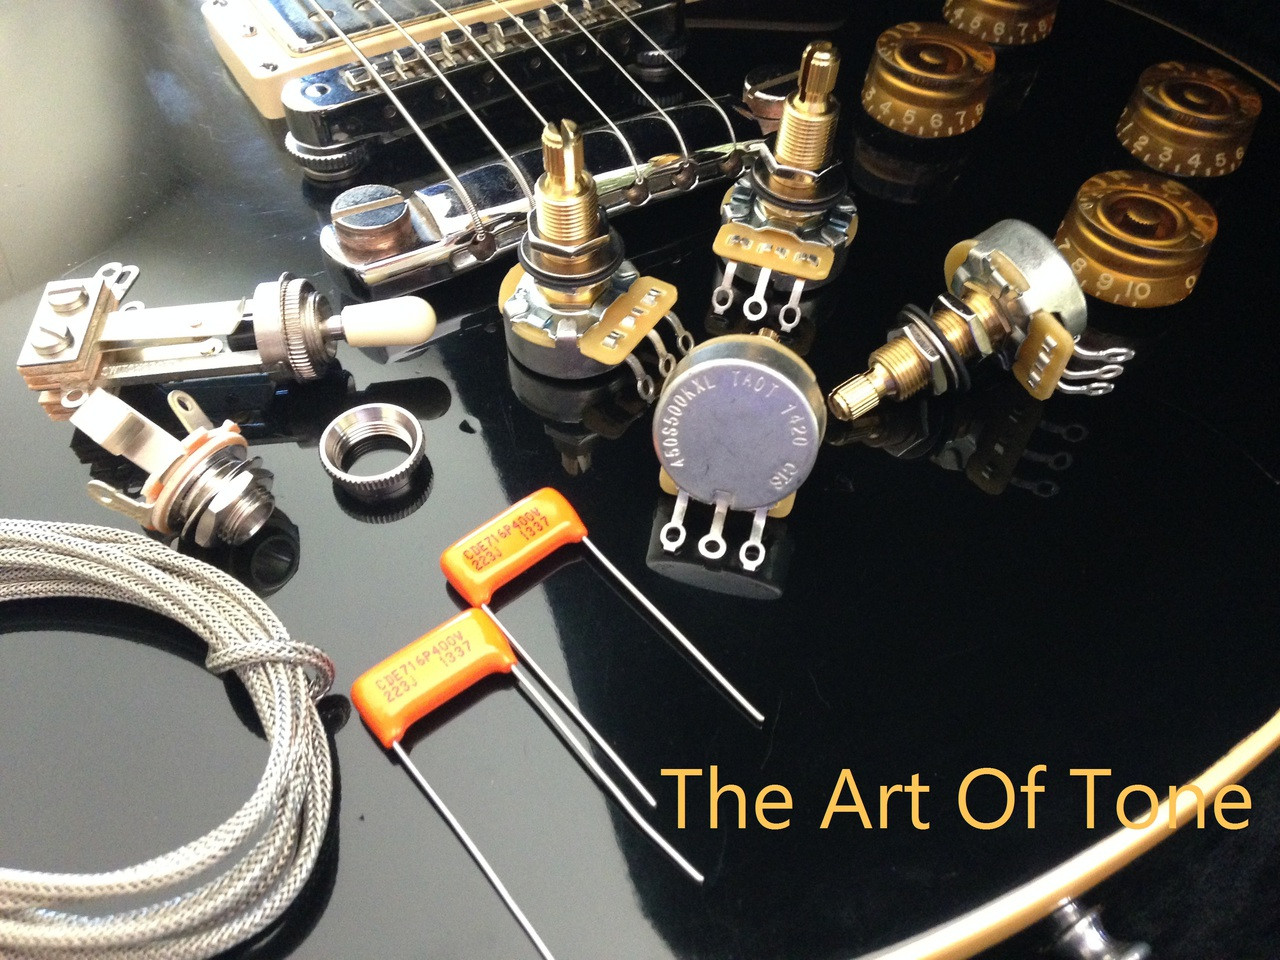 wiring kit gibson les paul long shaft cts taot 500kxl pots rh theartoftone com